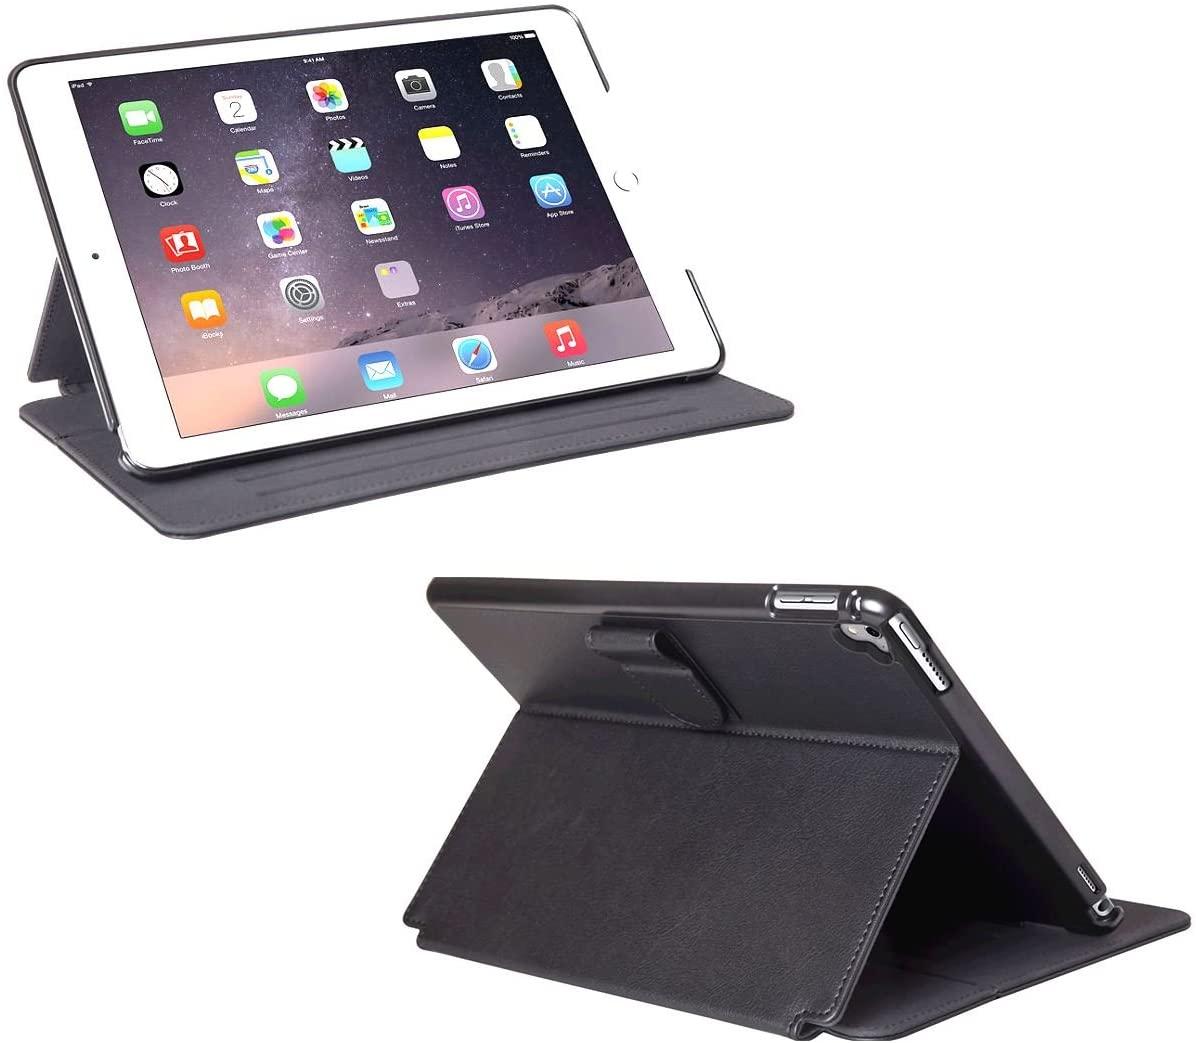 Verizon OEM Case for Apple iPad Pro 9.7